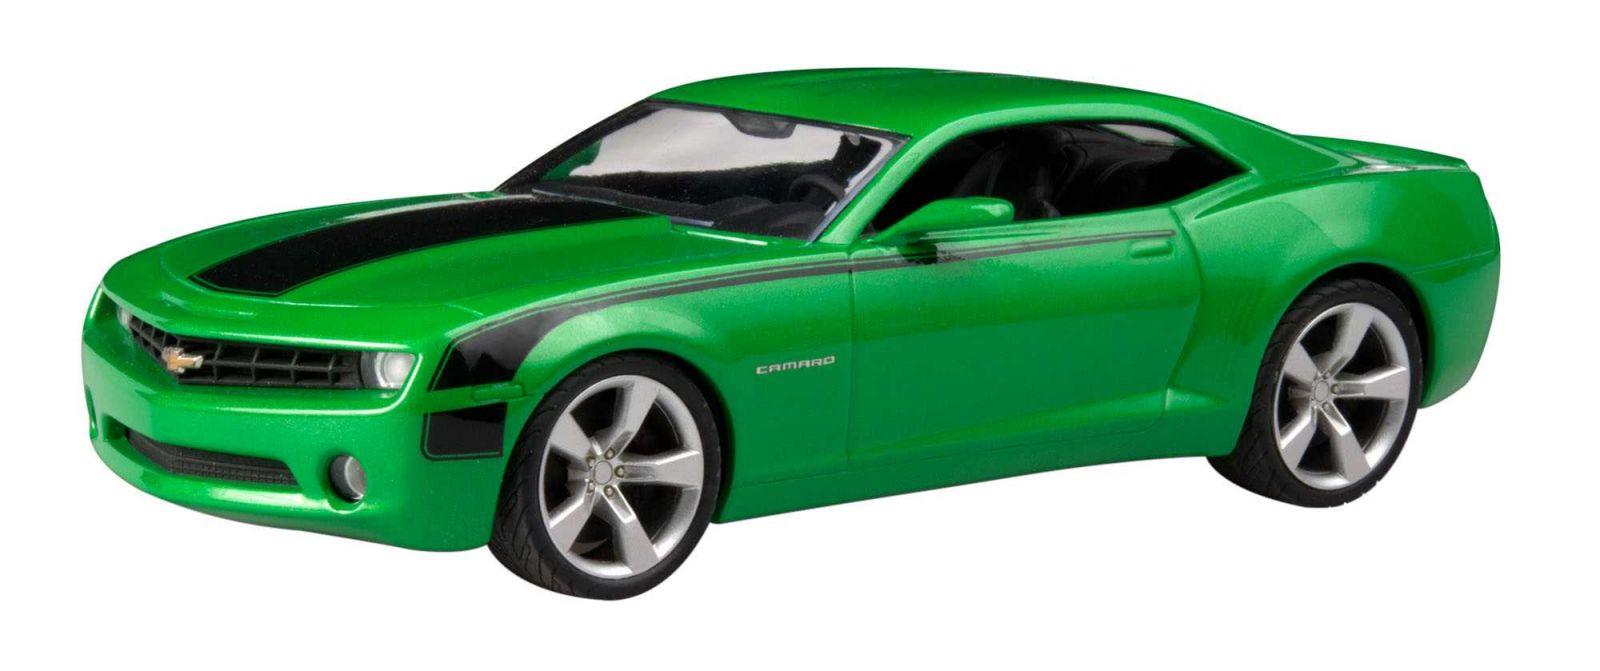 Snap Kit MONOGRAM auto 1527 - Camaro Concept Car (1:25) Plastikové modely